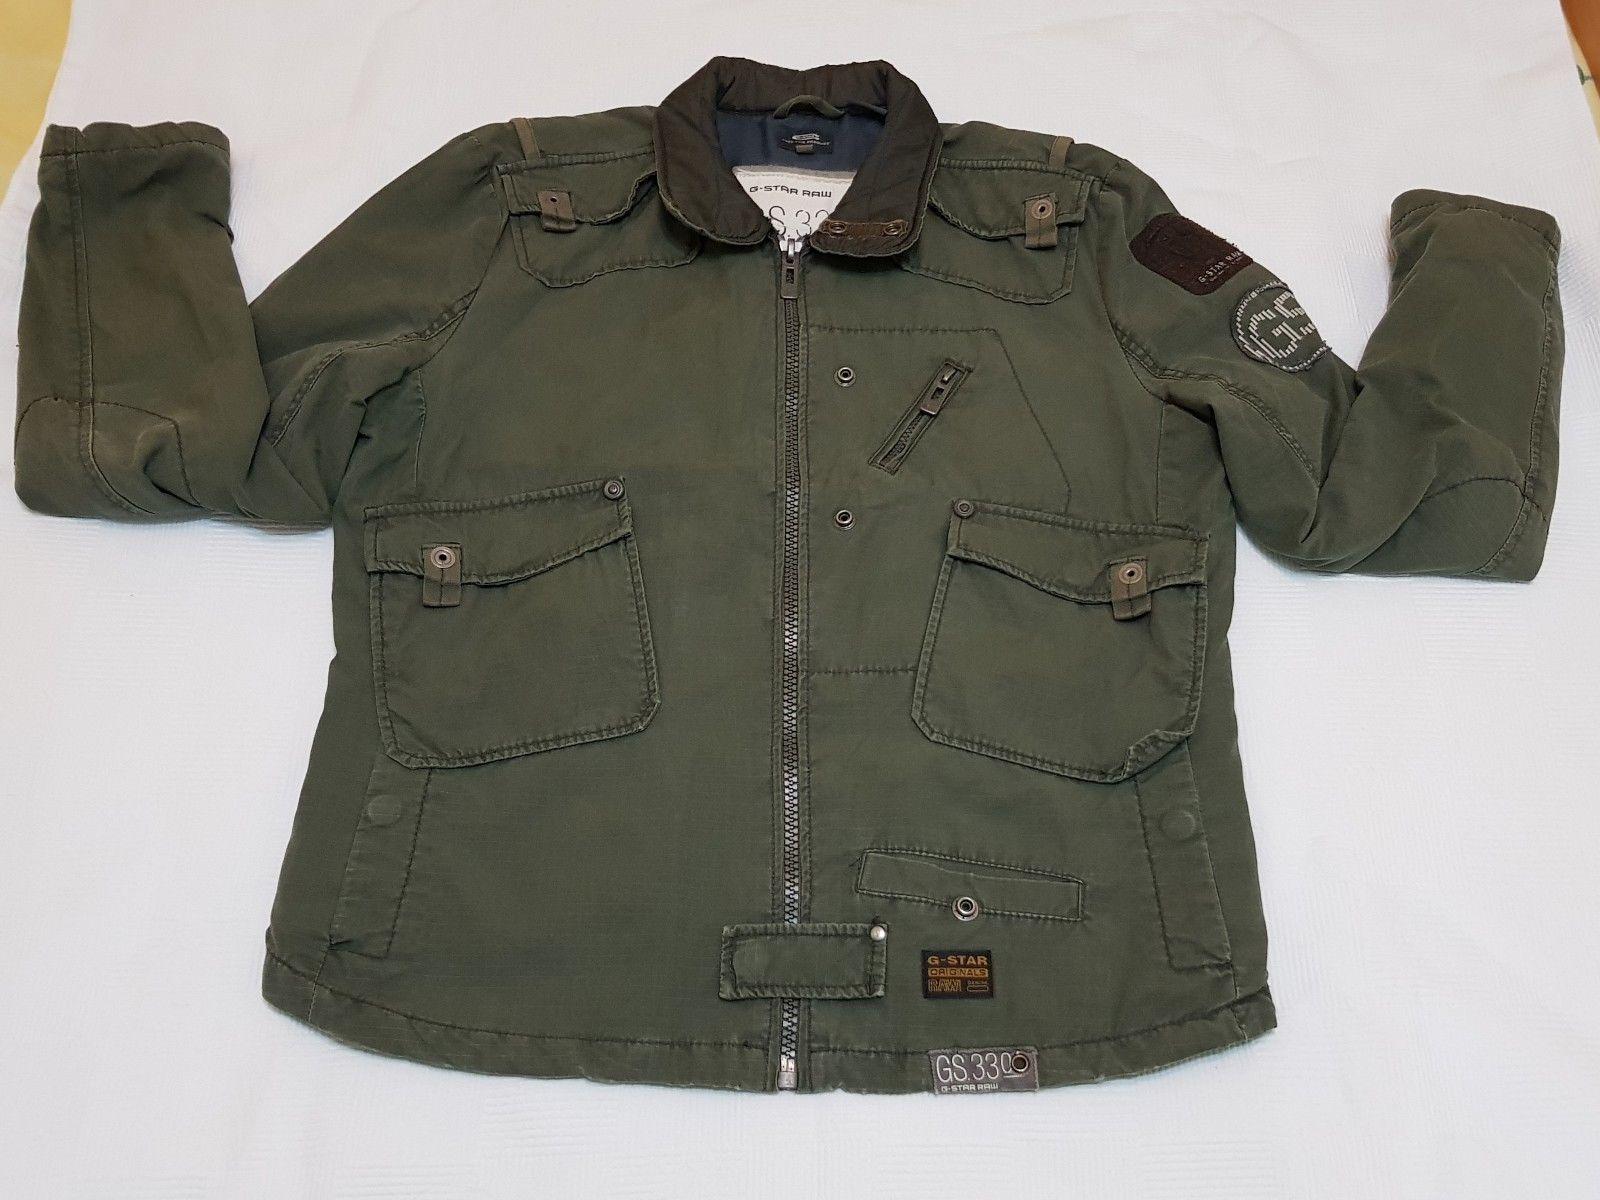 G Star Raw Men Jacket Gr L Transition Jacket Blan Overloaded Jkt Ebay G Star Raw G Star Jackets